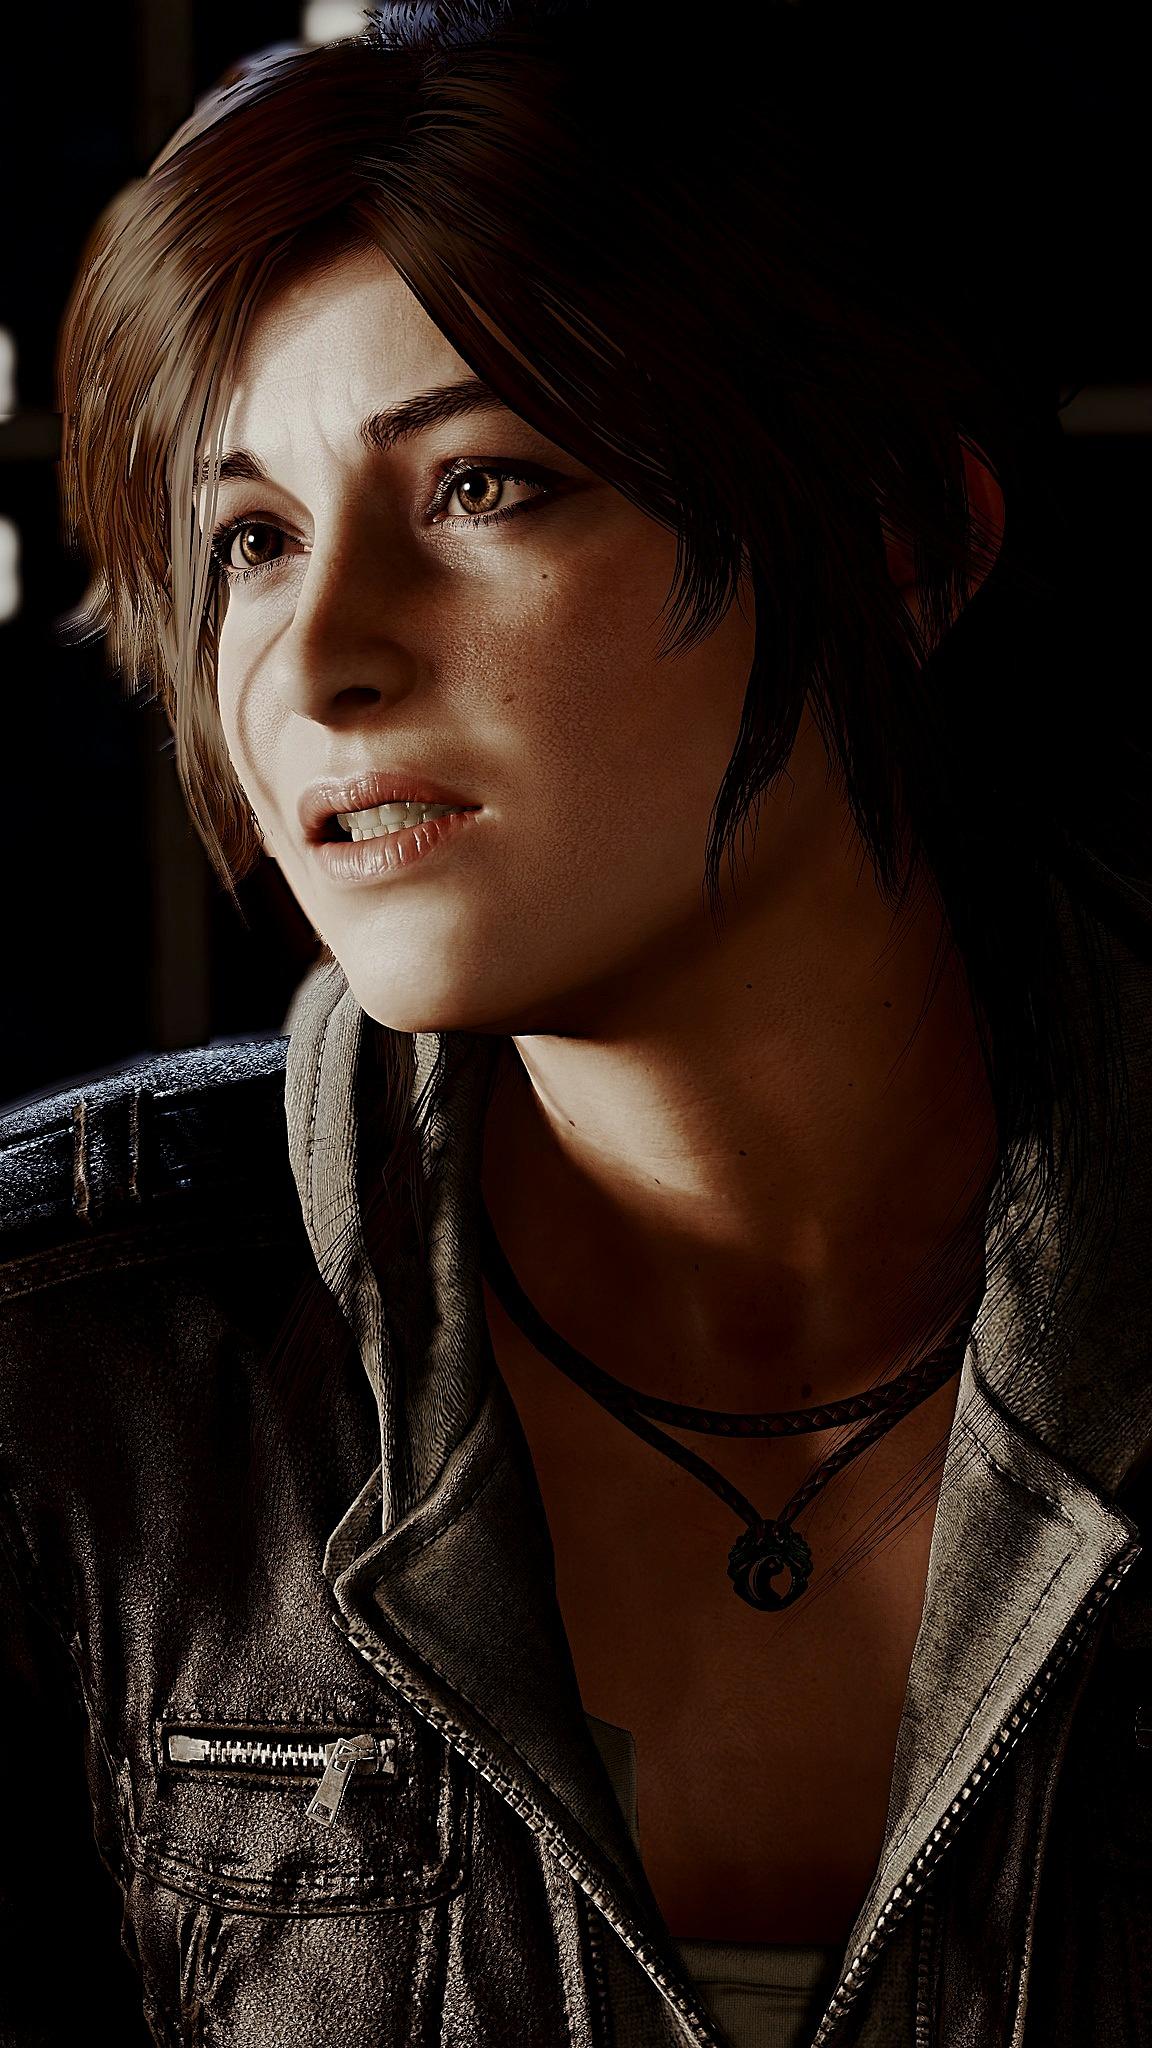 137625258_b (2).jpg - Rise of the Tomb Raider